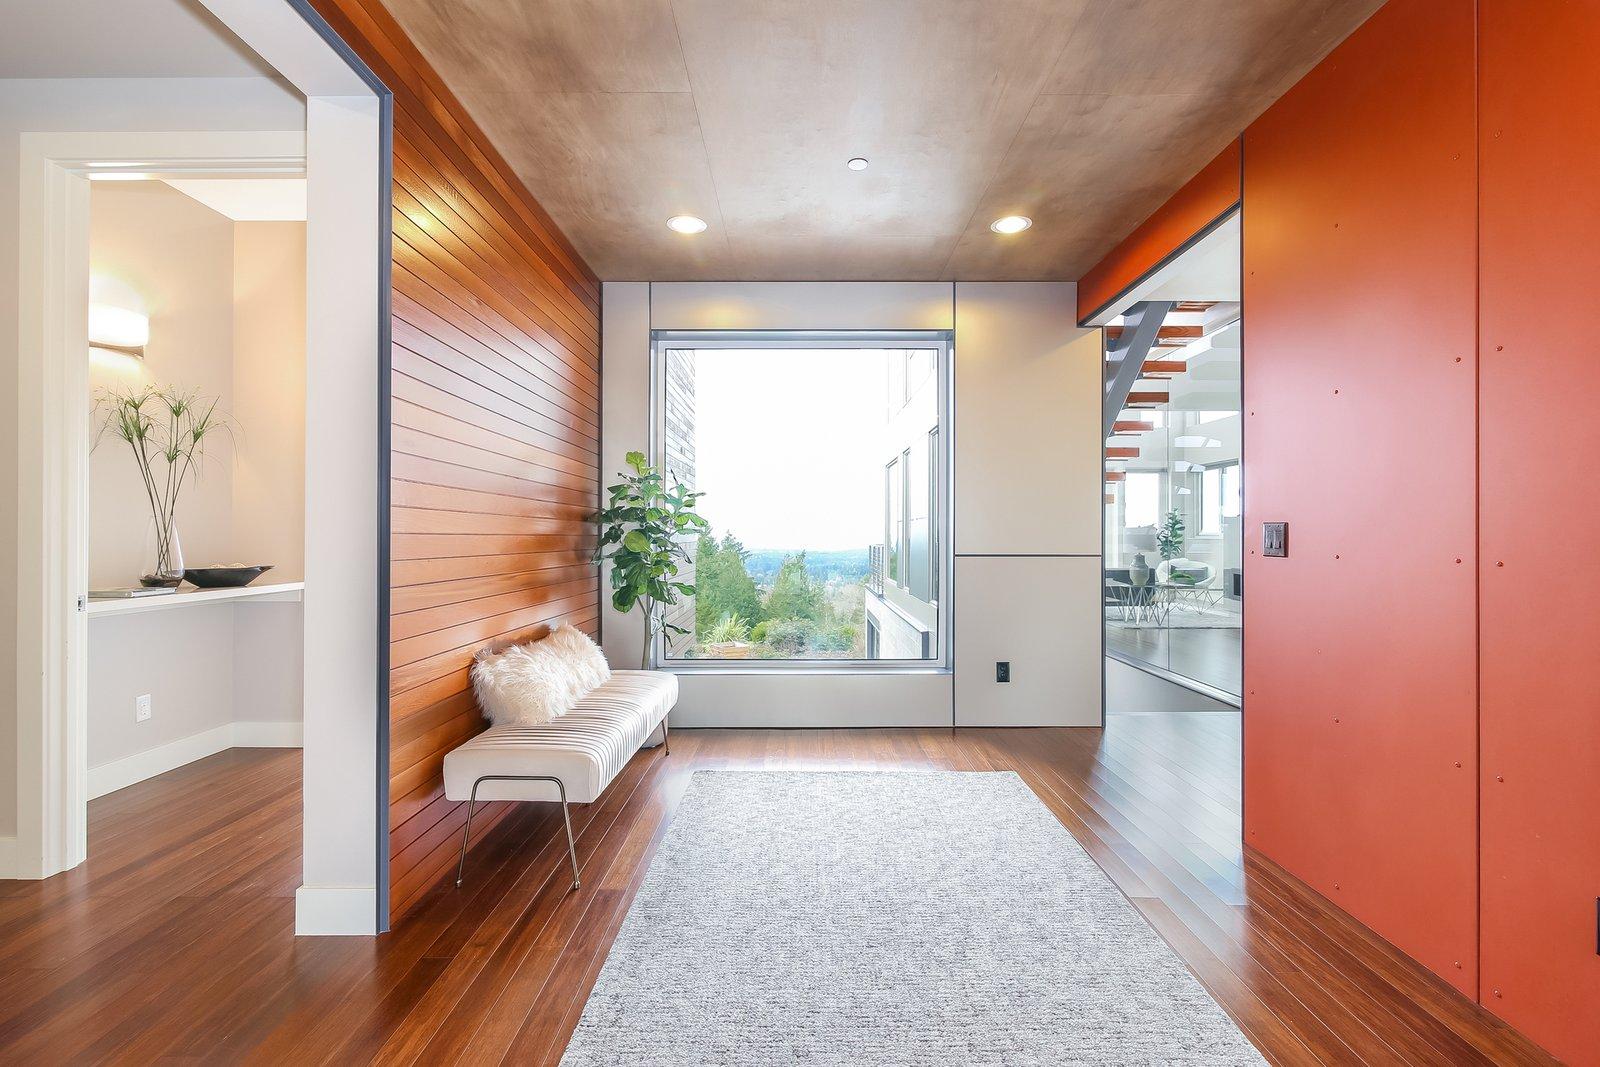 Hallway and Medium Hardwood Floor  Japanese Builder Ichijo Creates Net-Zero Energy Home by PlanOmatic